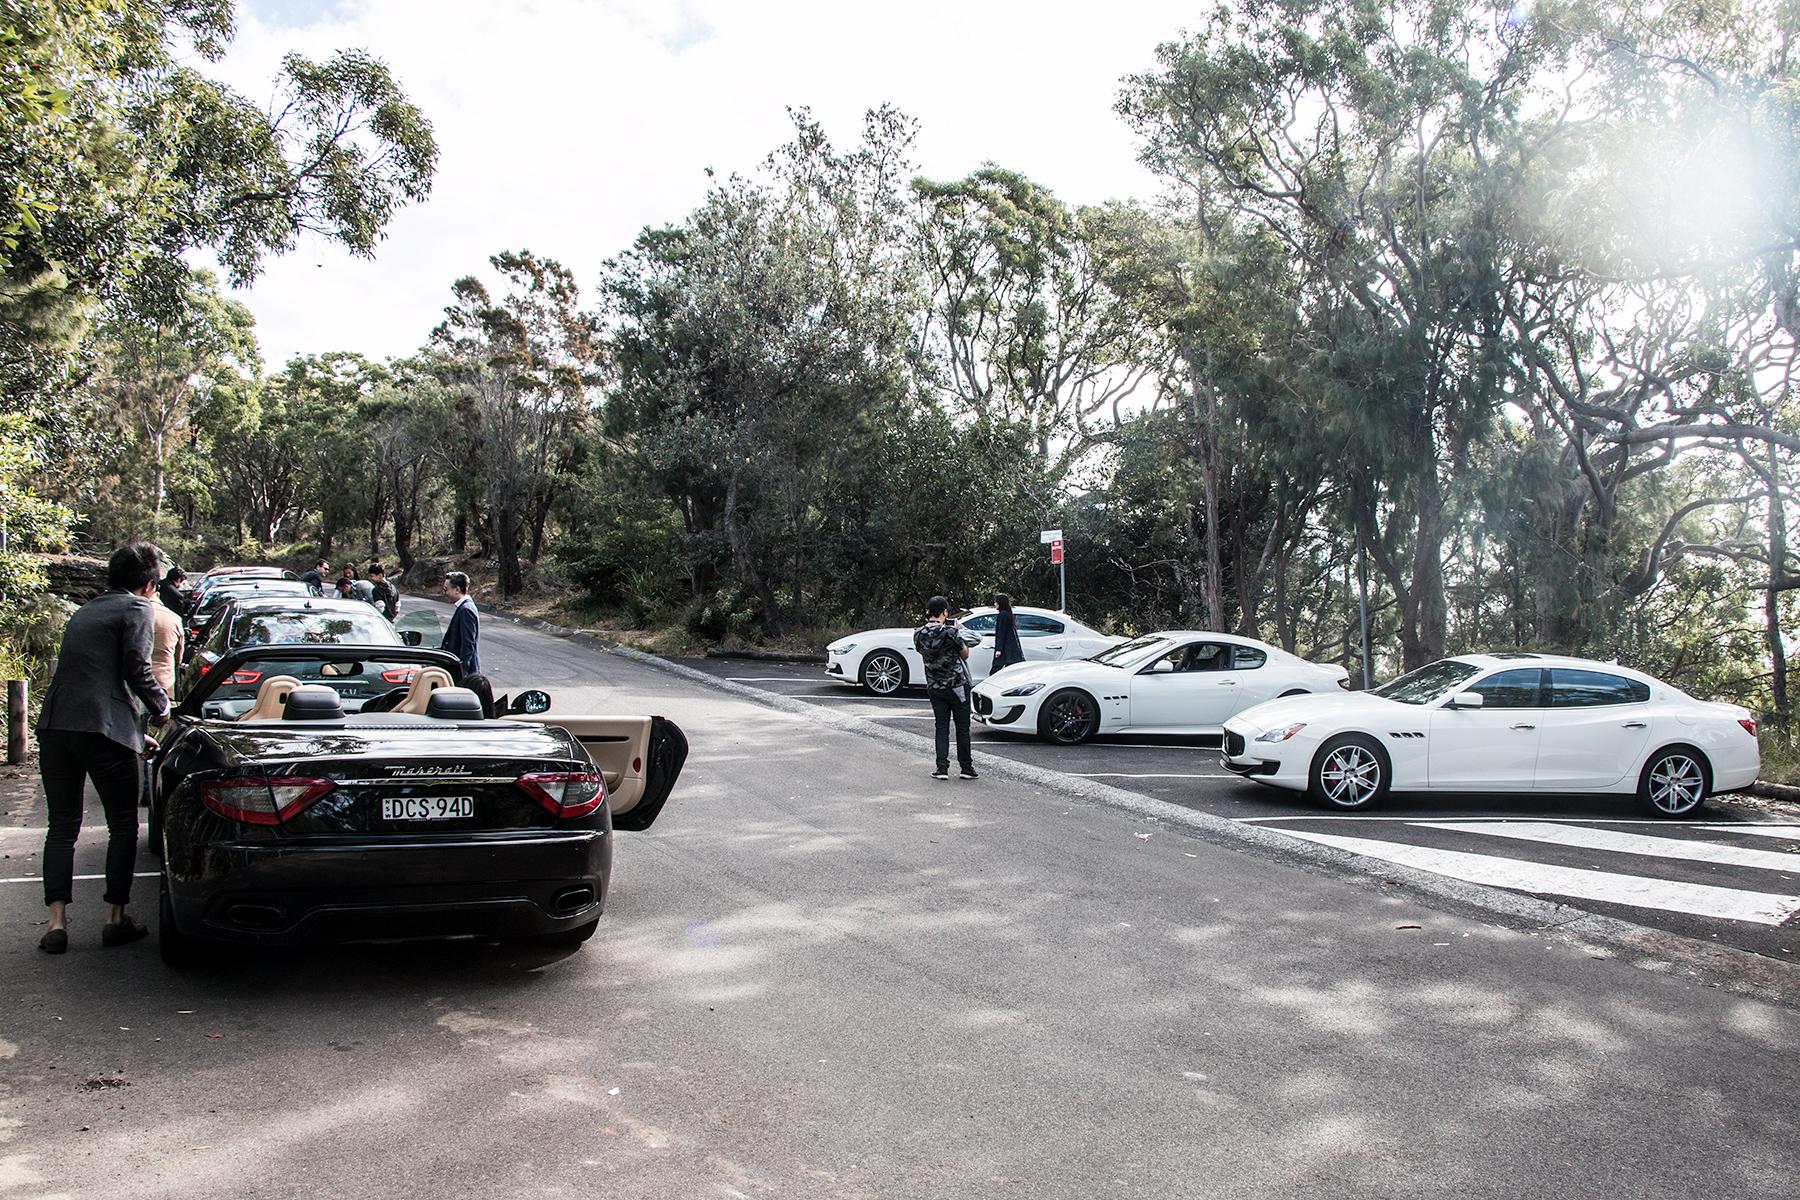 Drivers break at West Head